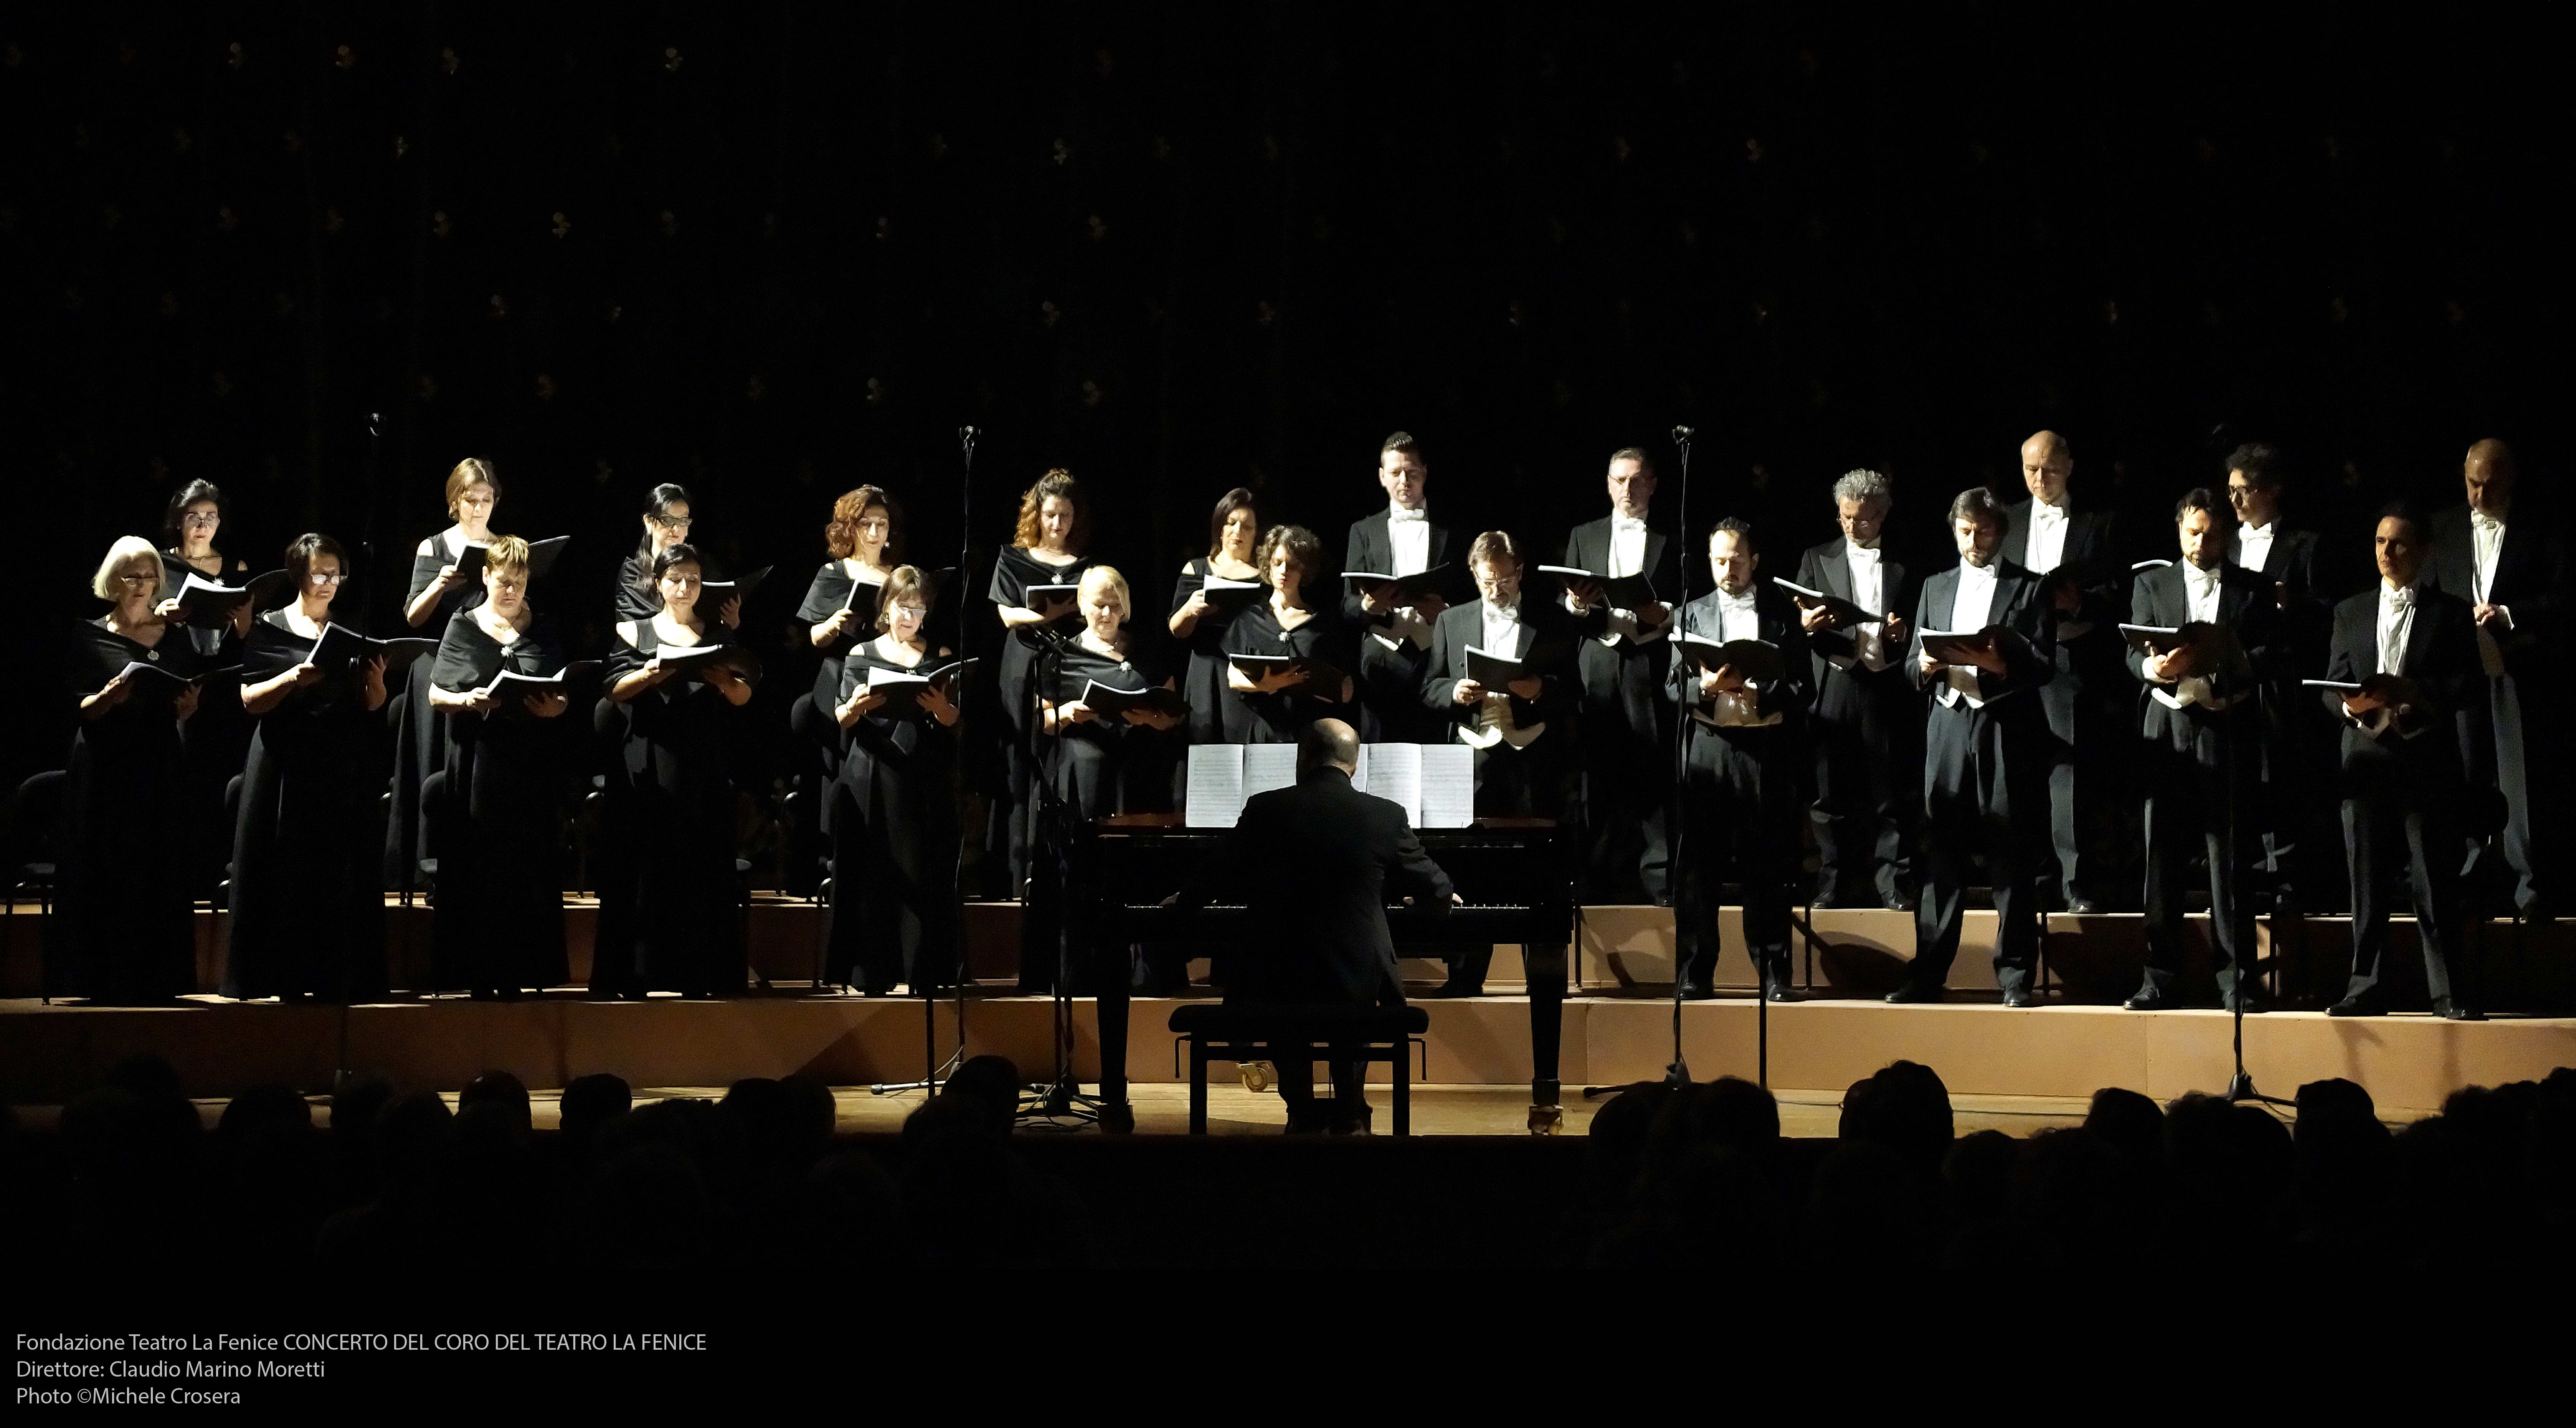 Coro del Teatro La Fenice